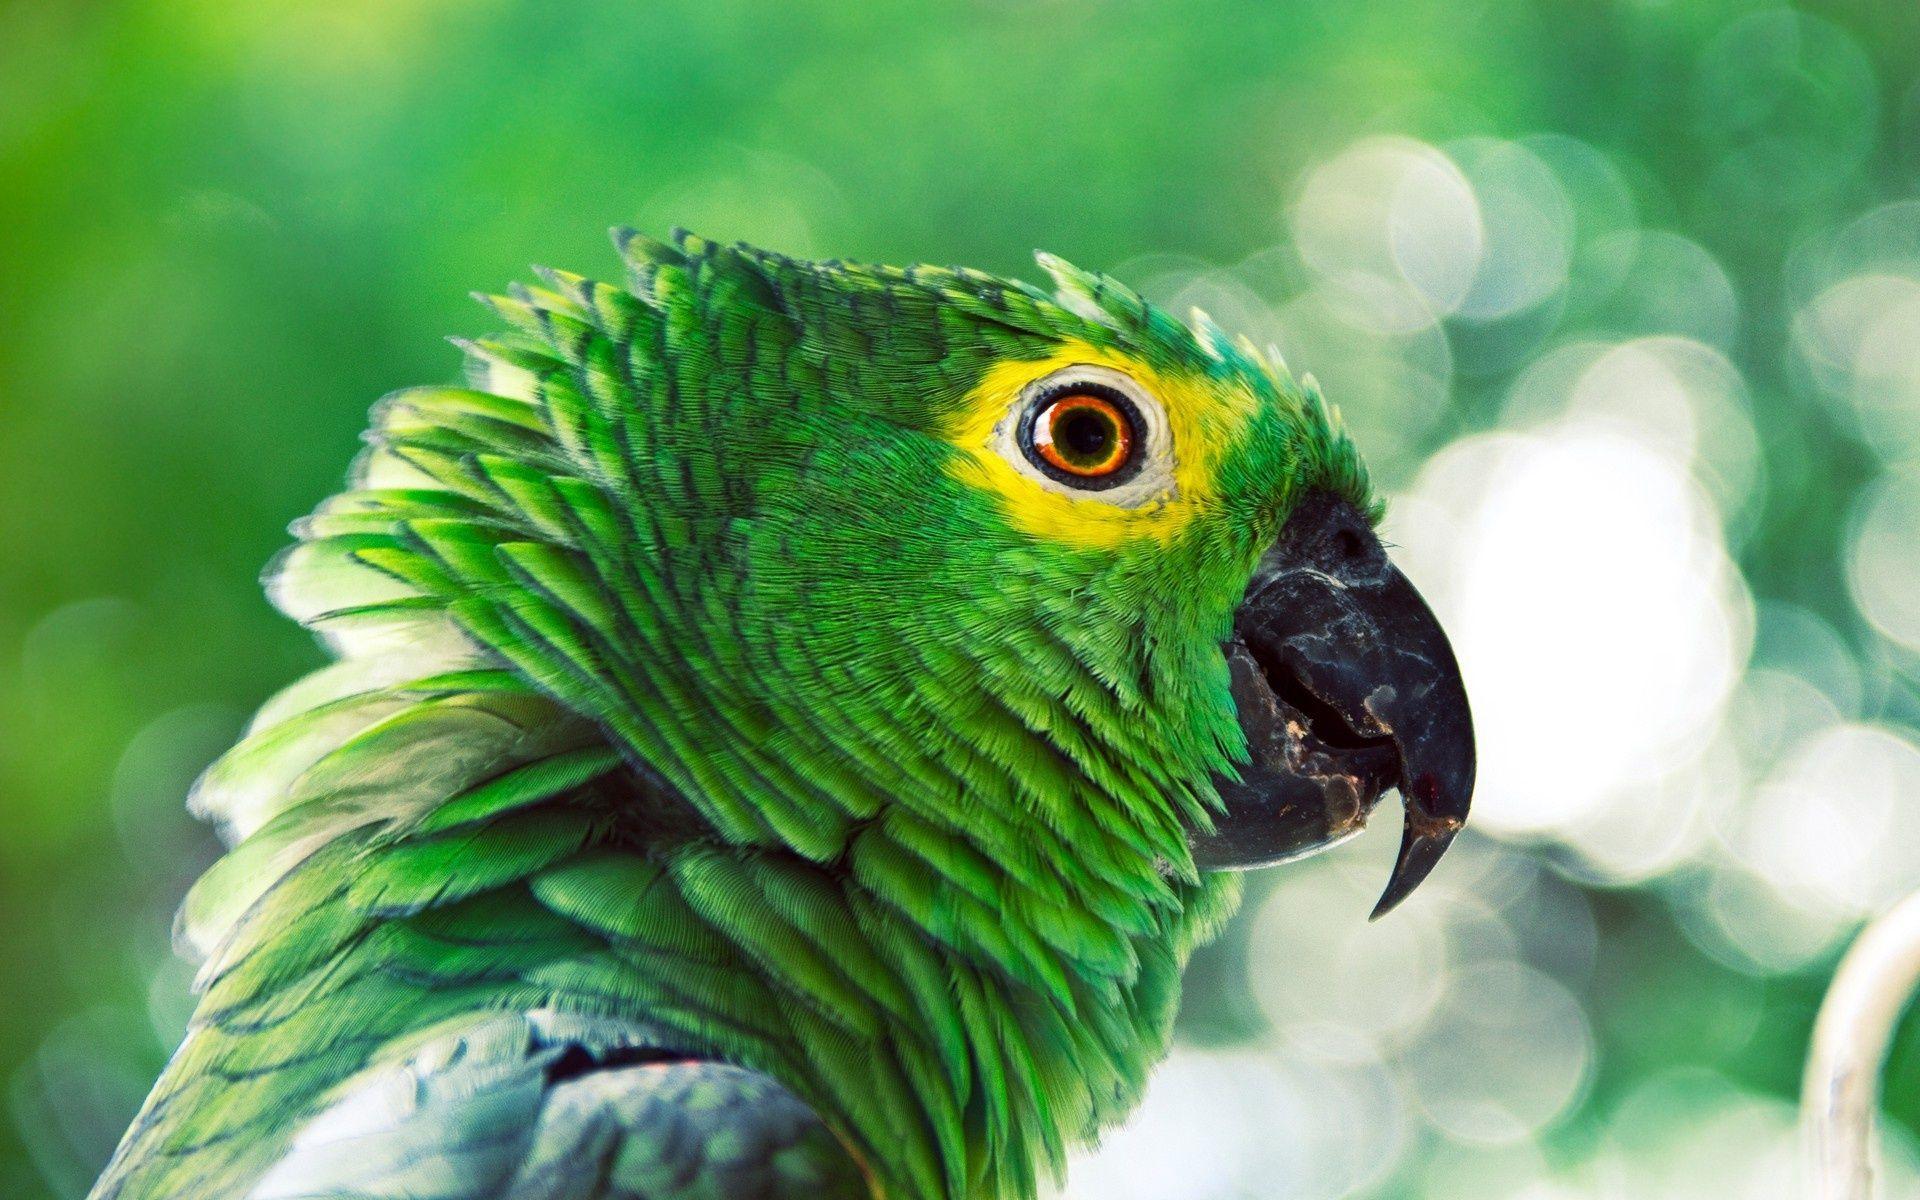 Green Parrot WallpapersHD WallpapersLaptop Wallpapers